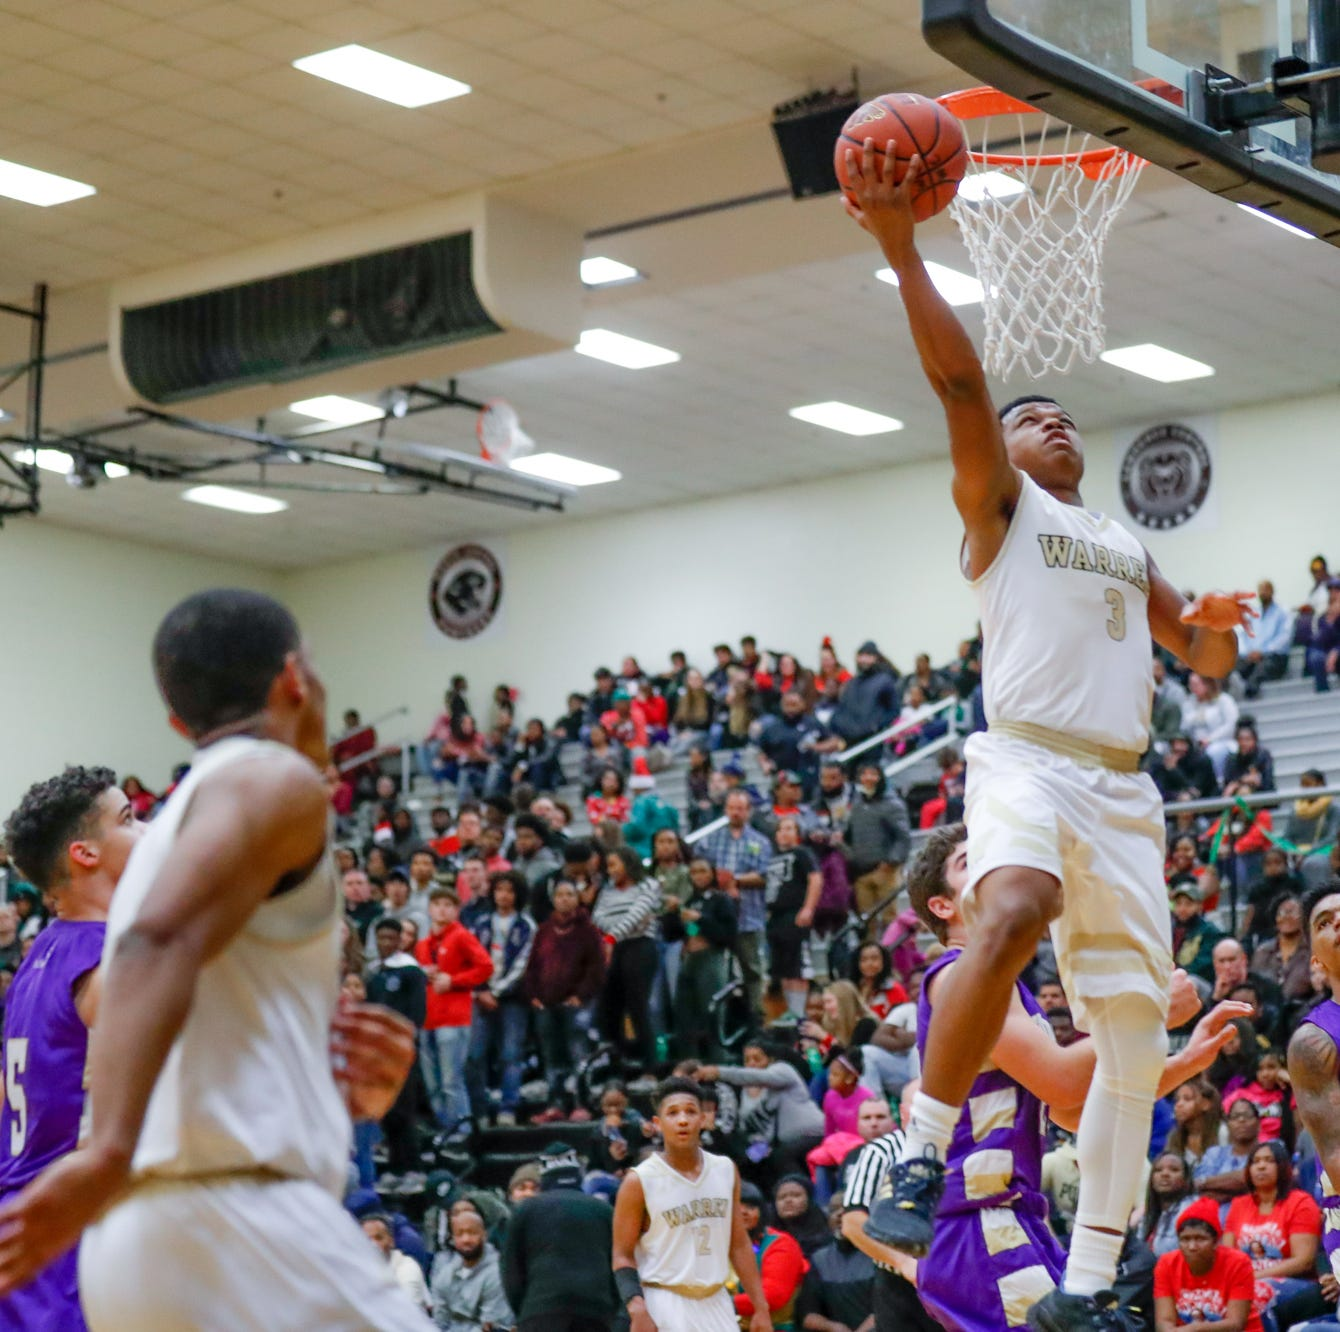 Warren Central High School's Manuel Brown (3) shoots a layup during a varsity boys basketball game between Cathedral High School and Warren Central High School at Warren Central on Friday, Dec. 7, 2018.